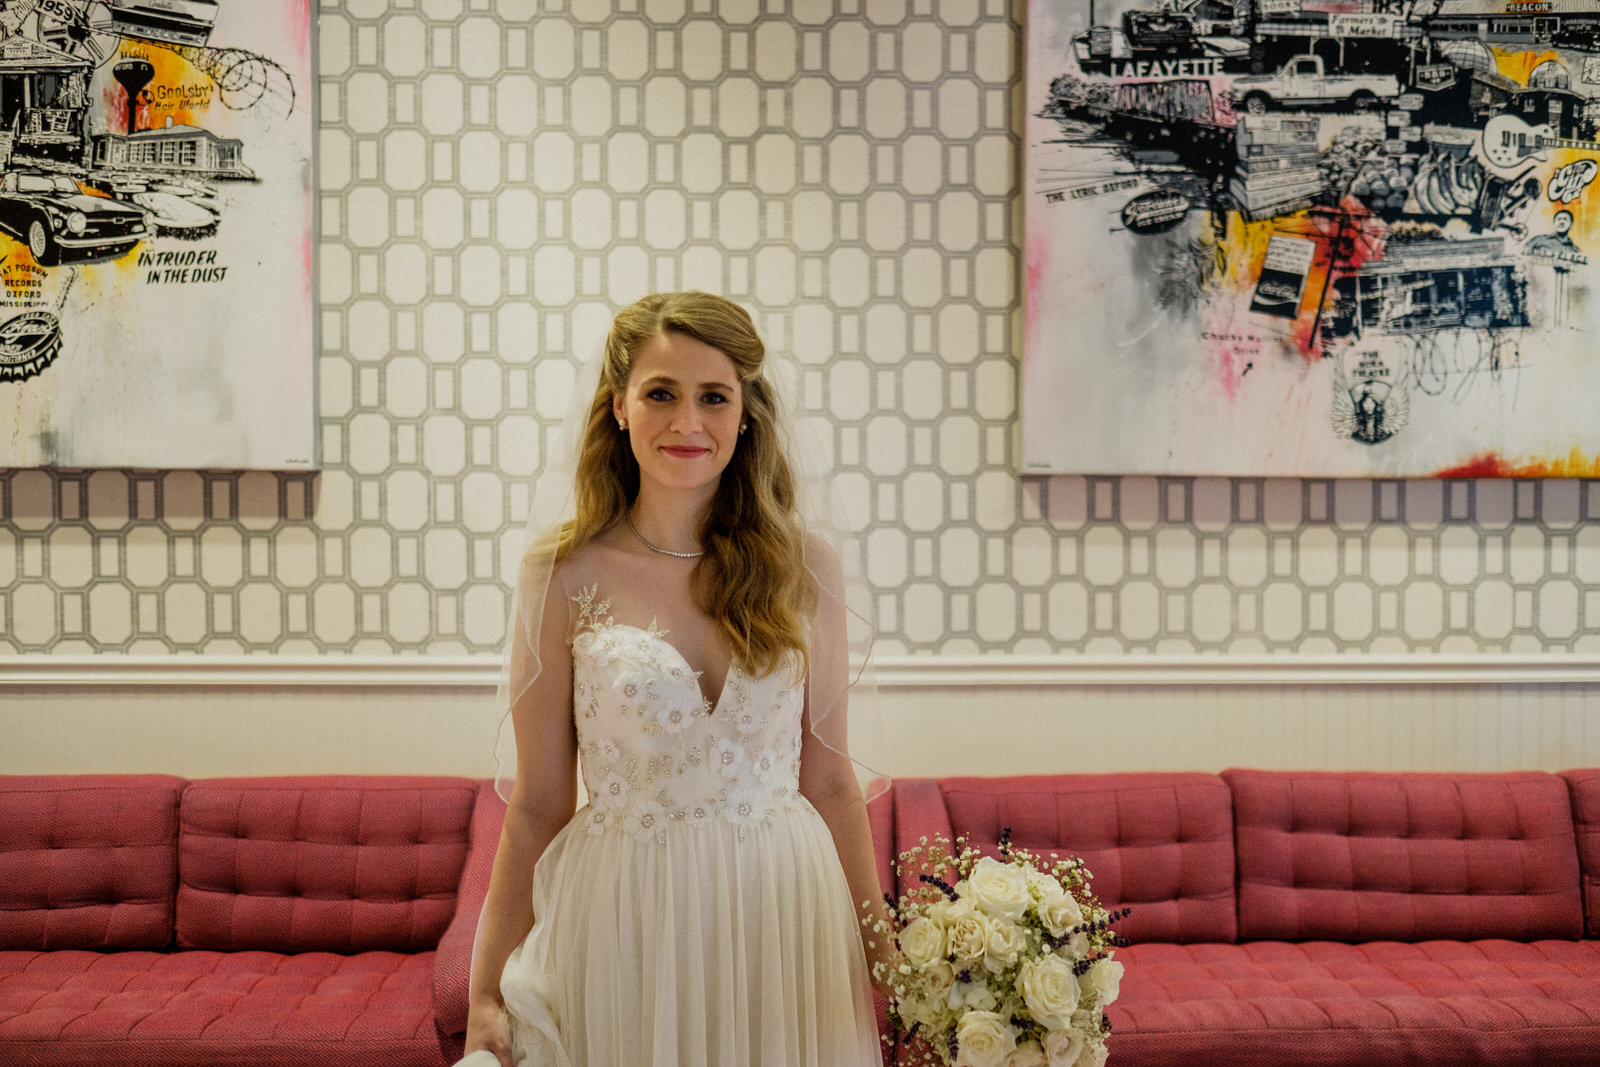 Oxford_Mississippi_wedding_photographer_17.JPG